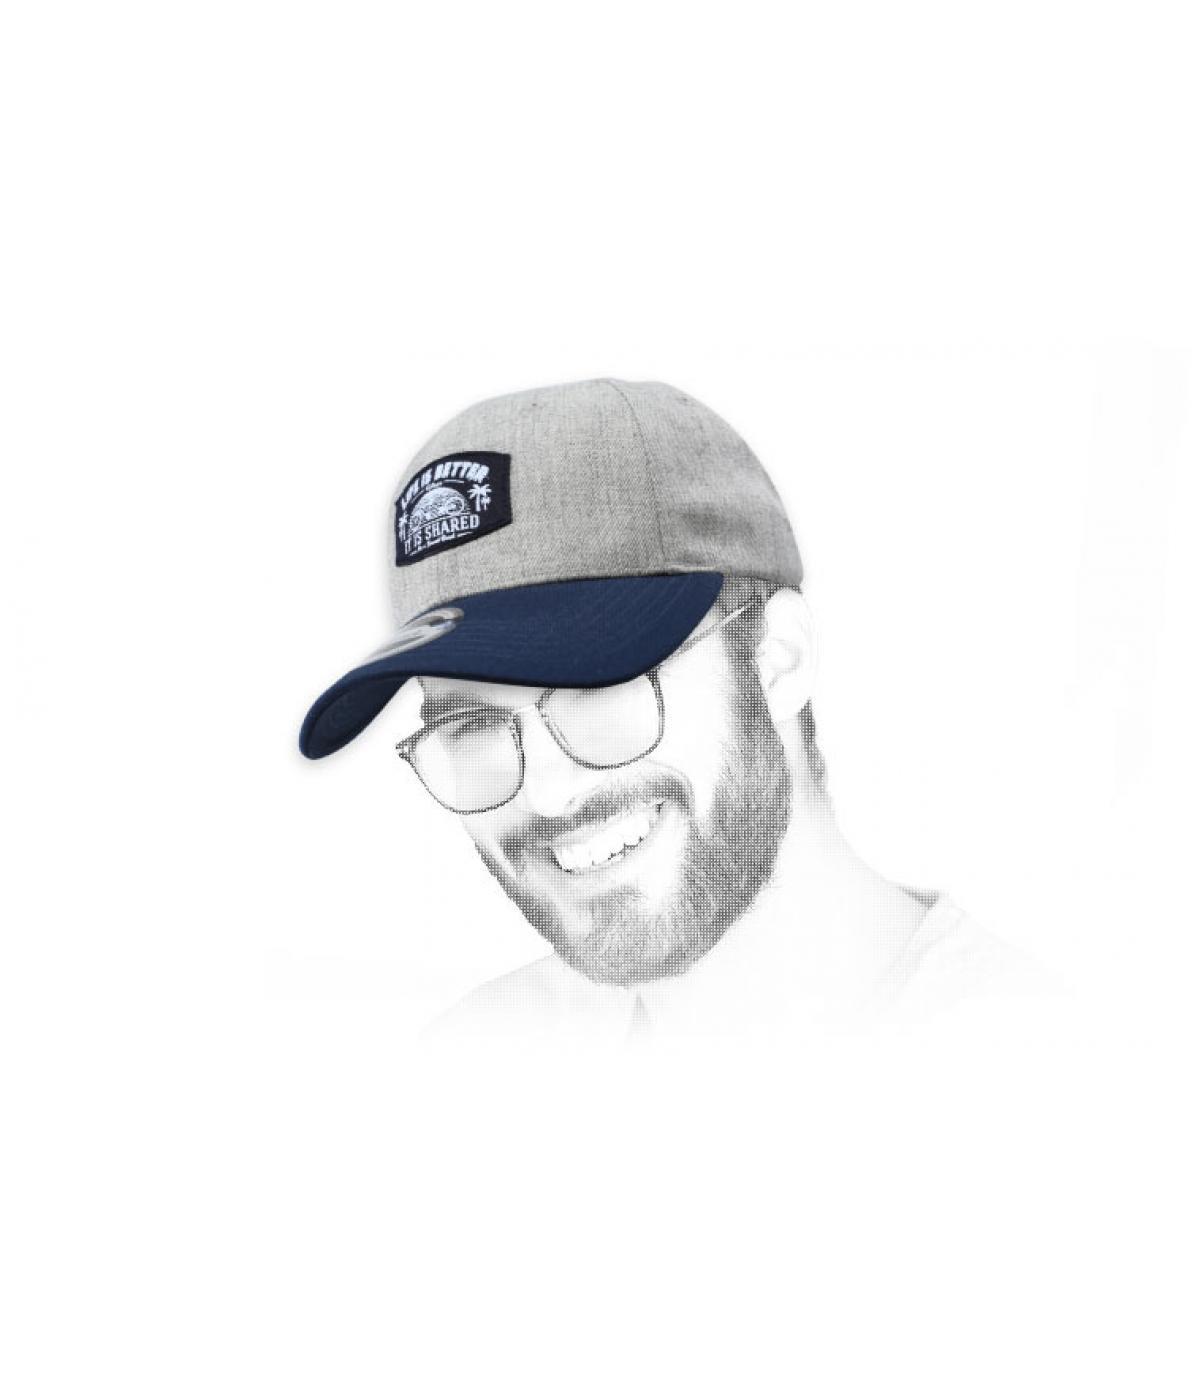 grey and blue bike cap